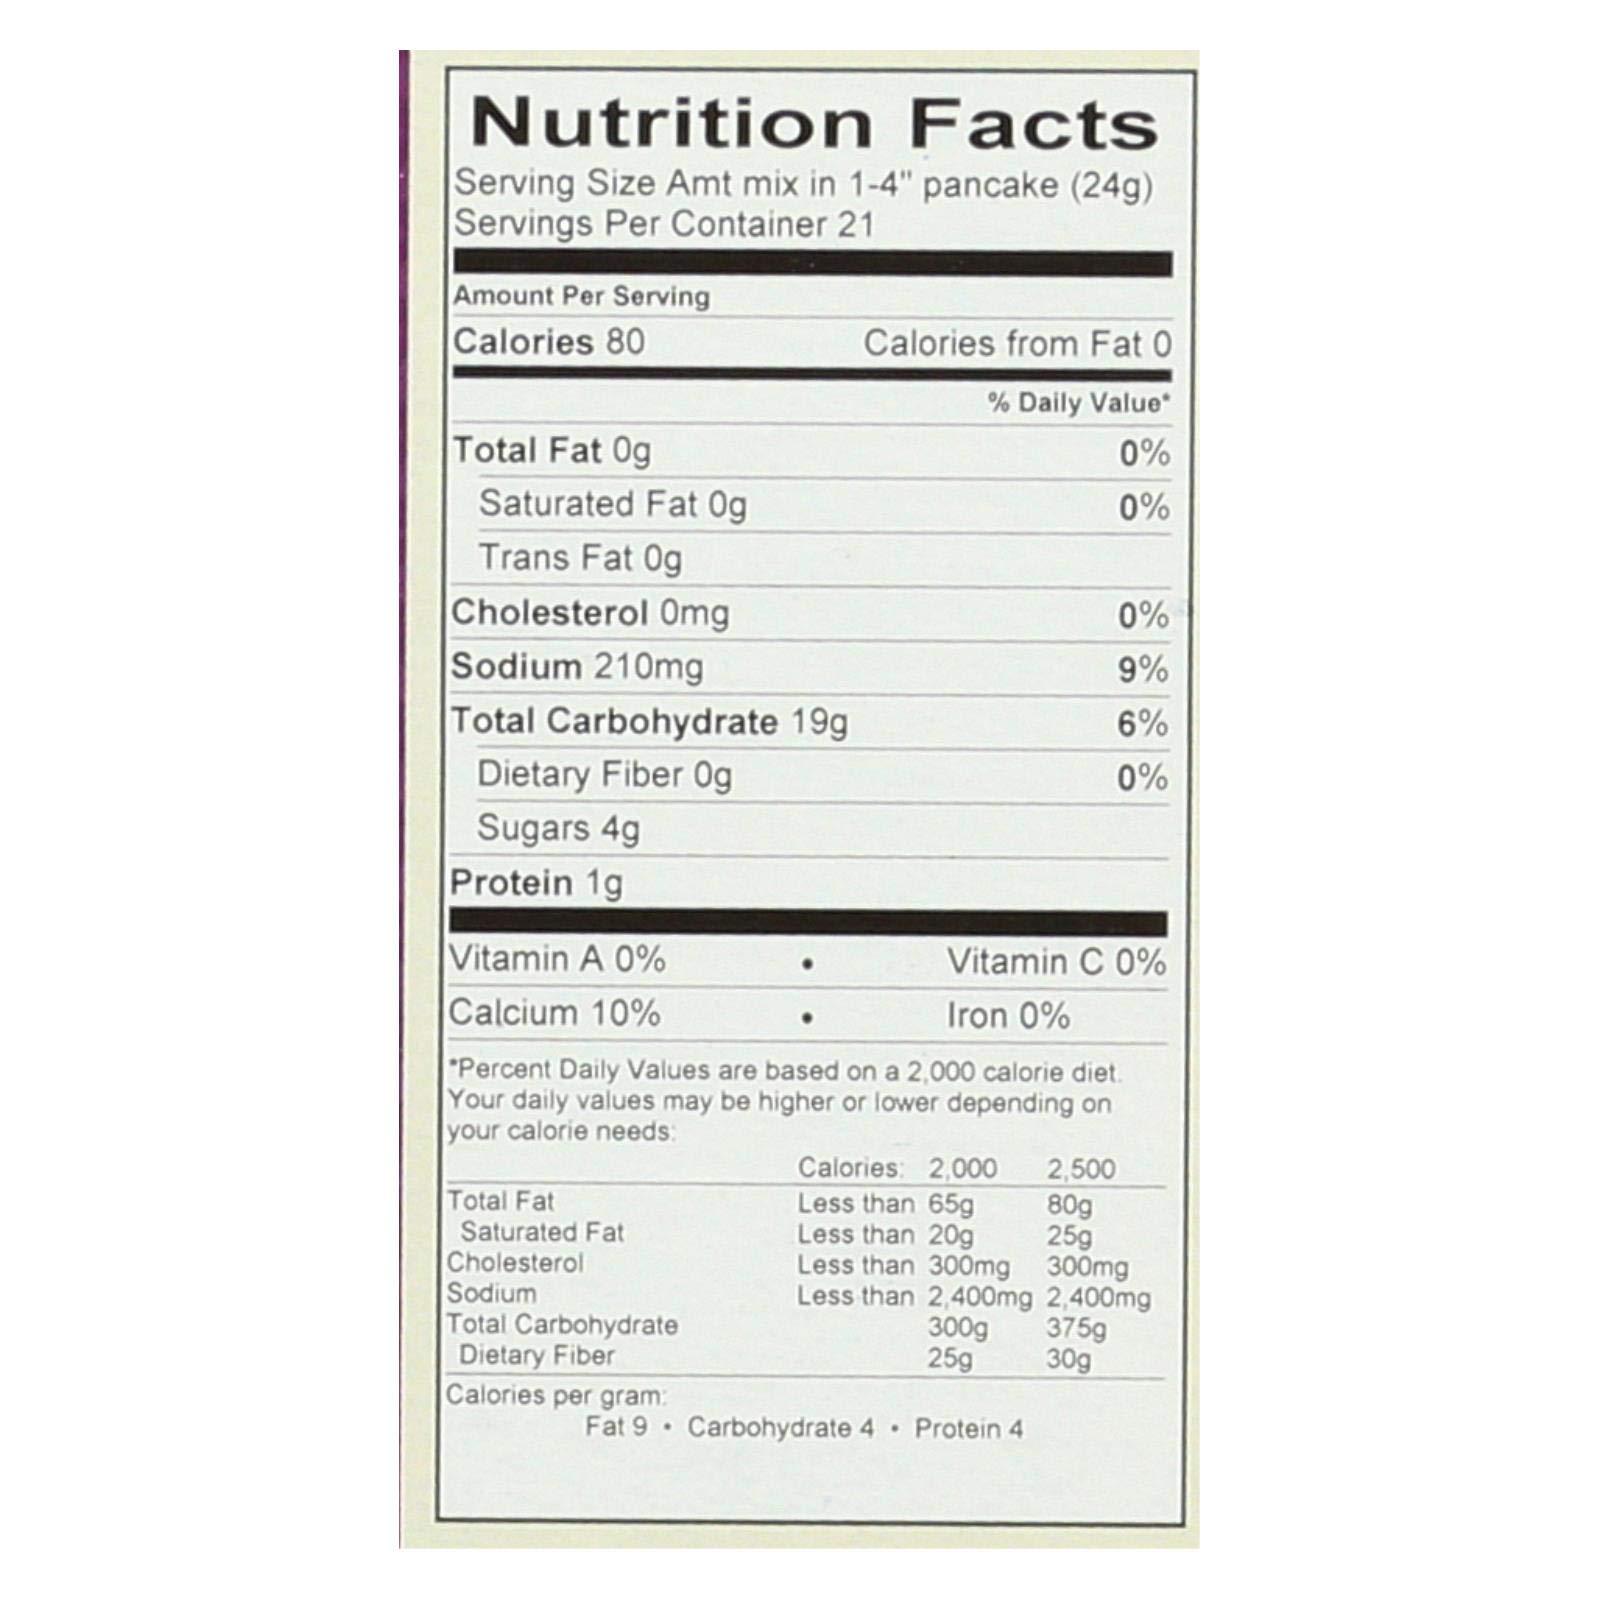 Cherrybrook Kitchen Gluten Free Pancake & Waffle Mix, 18 oz (Pack of 6) by Cherrybrook Kitchen (Image #1)